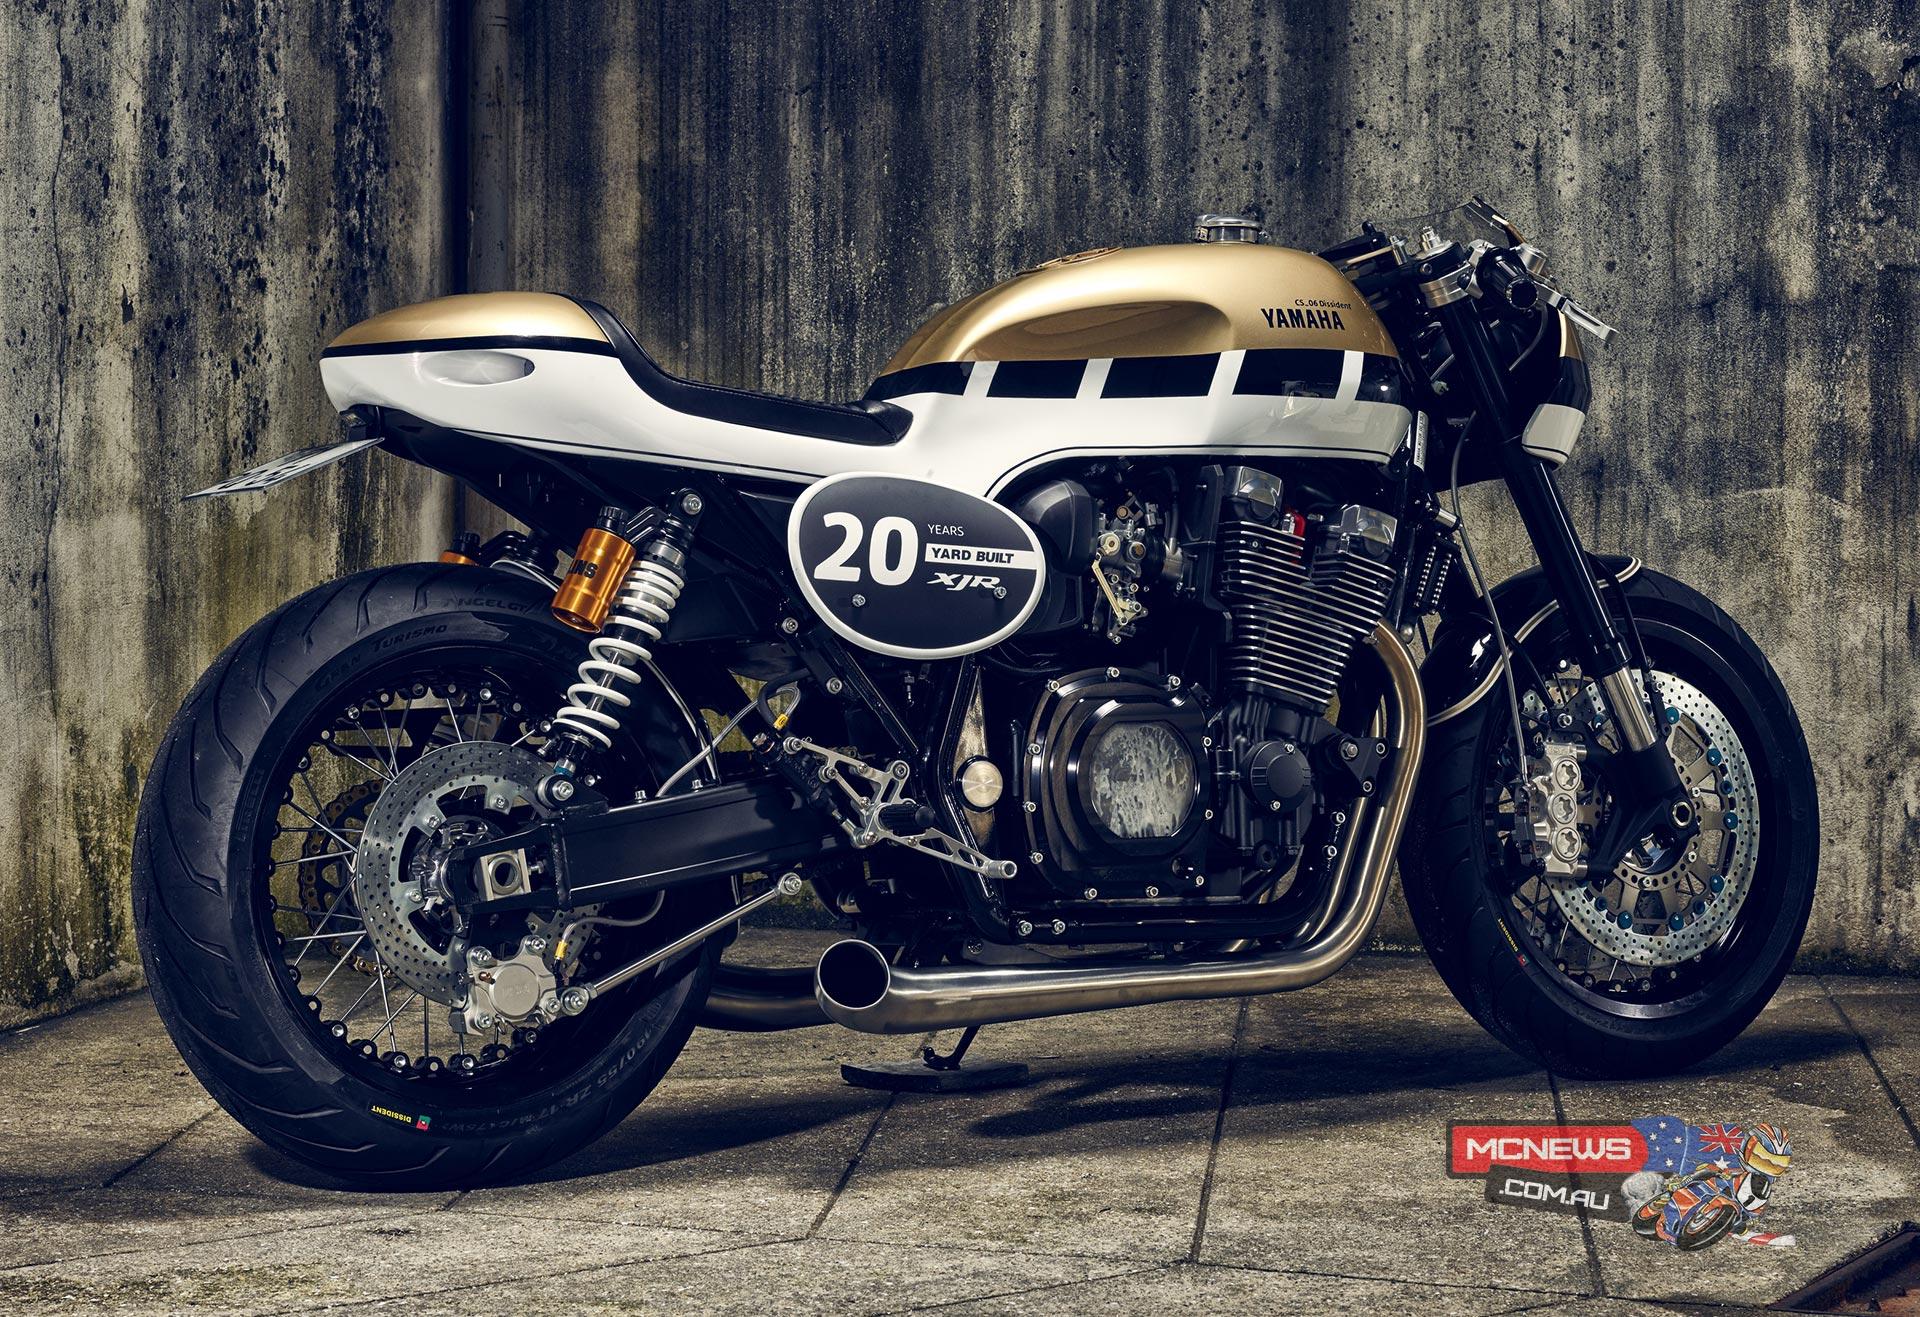 Yamaha XJR 20th Anniversary Continues With It RoCksbikes Yard Built CS 06